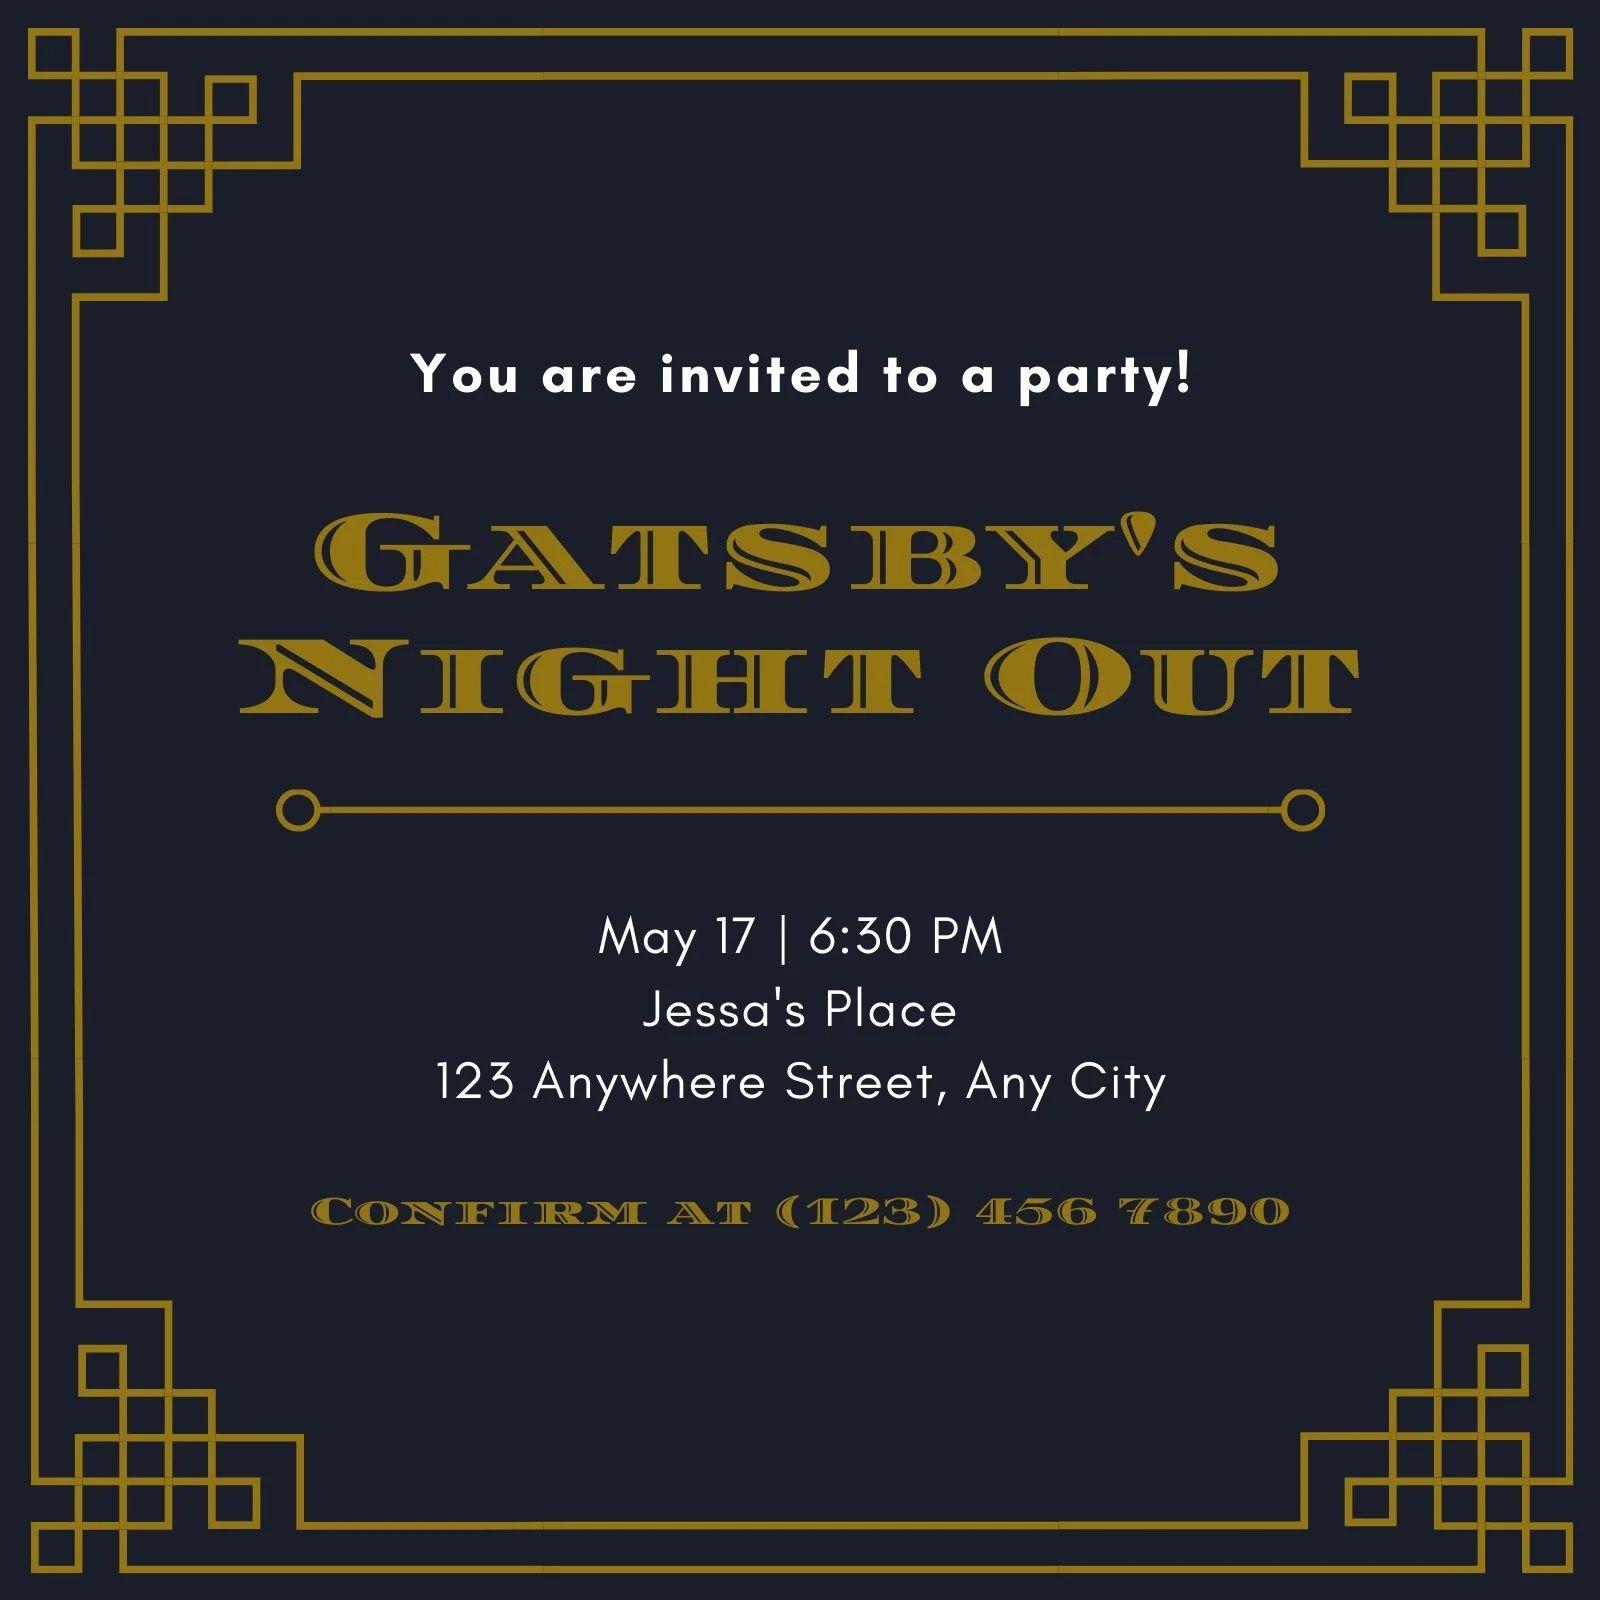 003 Wonderful Great Gatsby Invitation Template Image  Templates Free Download BlankFull